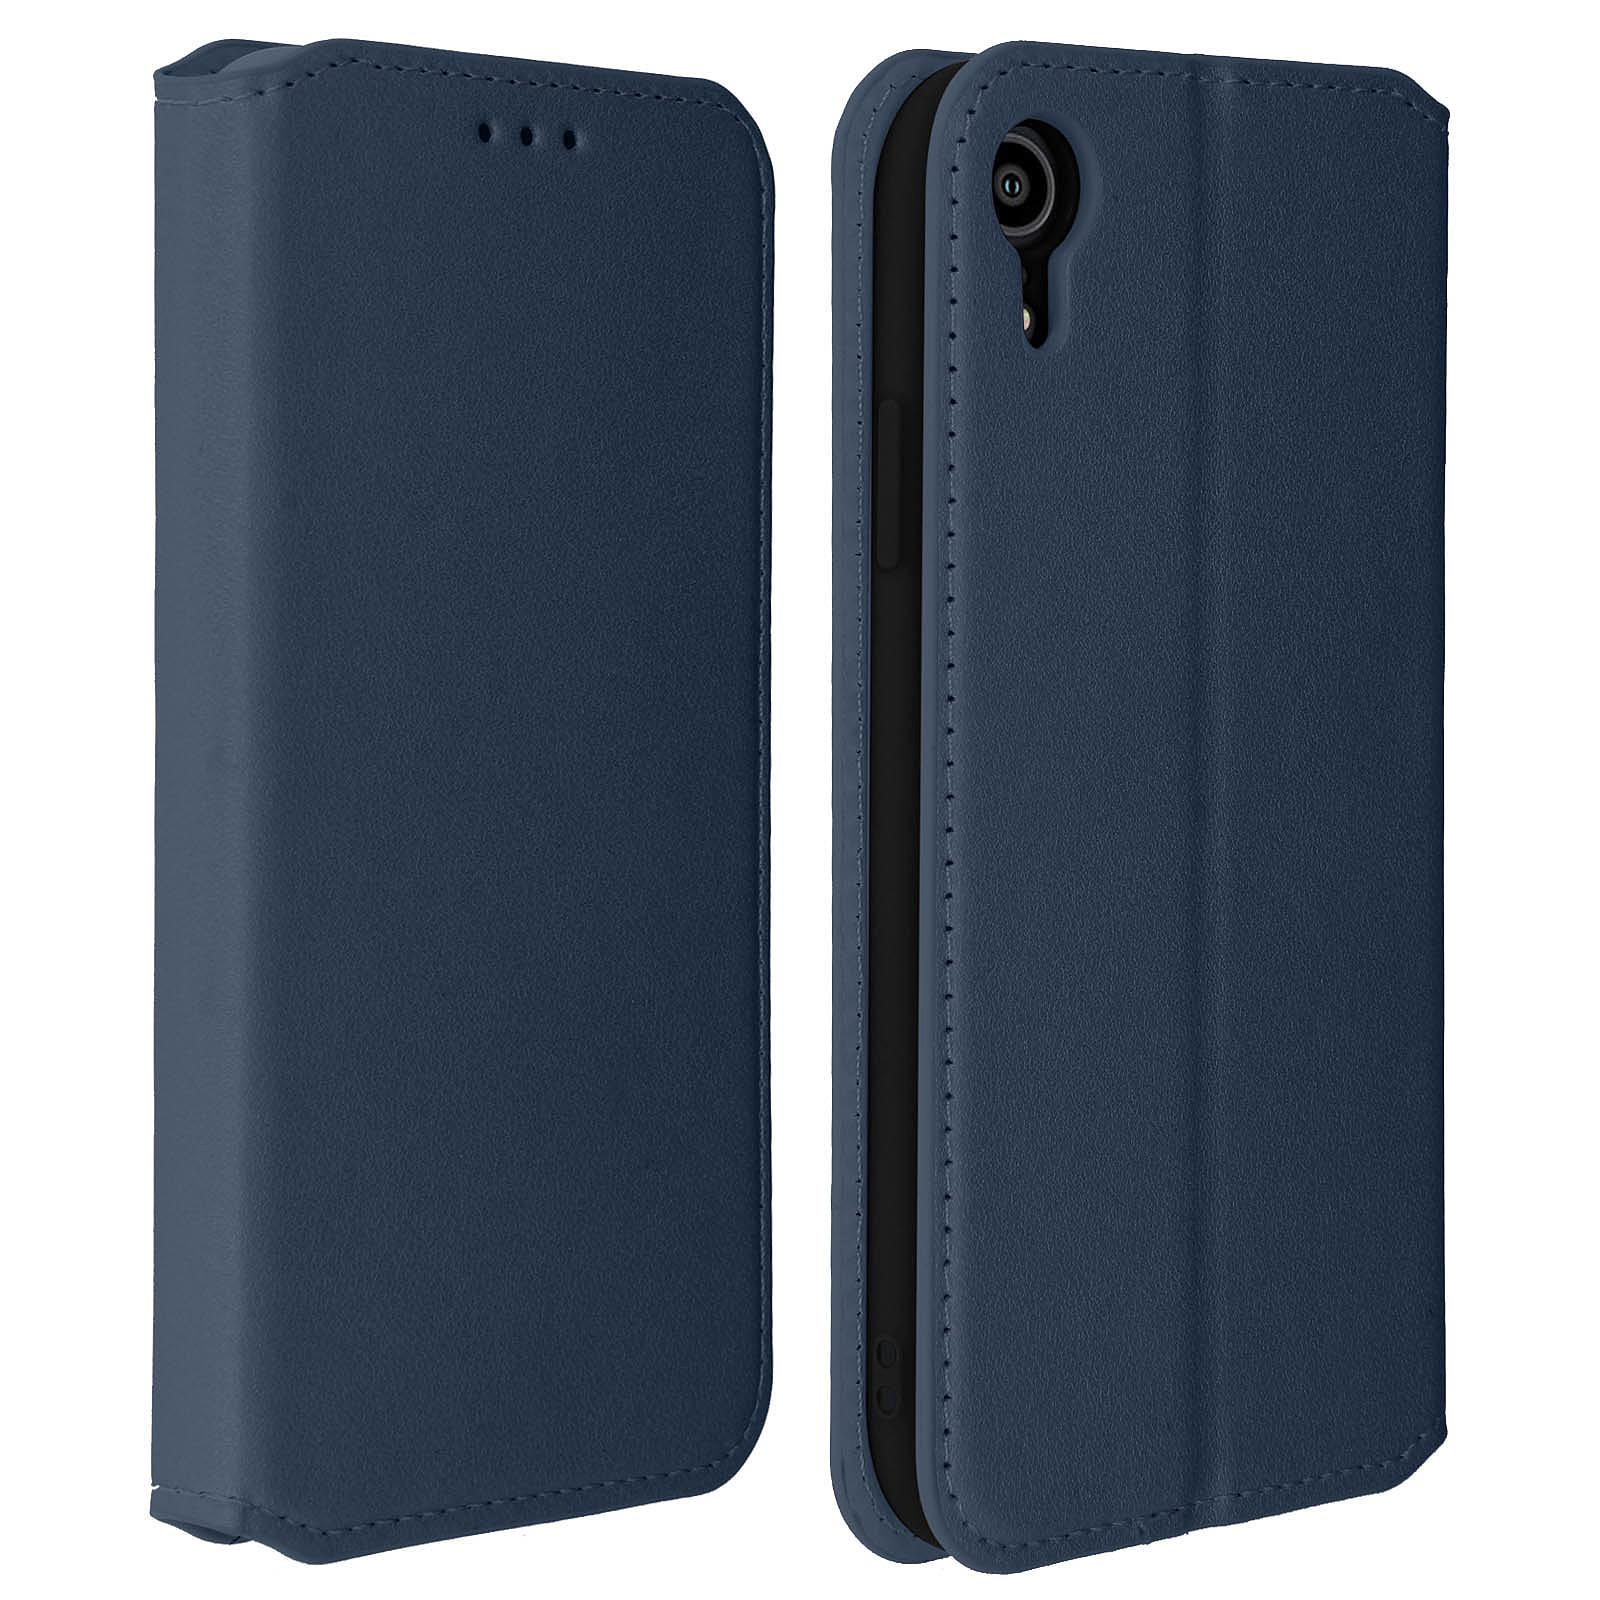 Avizar Etui folio Bleu Nuit Éco-cuir pour Apple iPhone XR